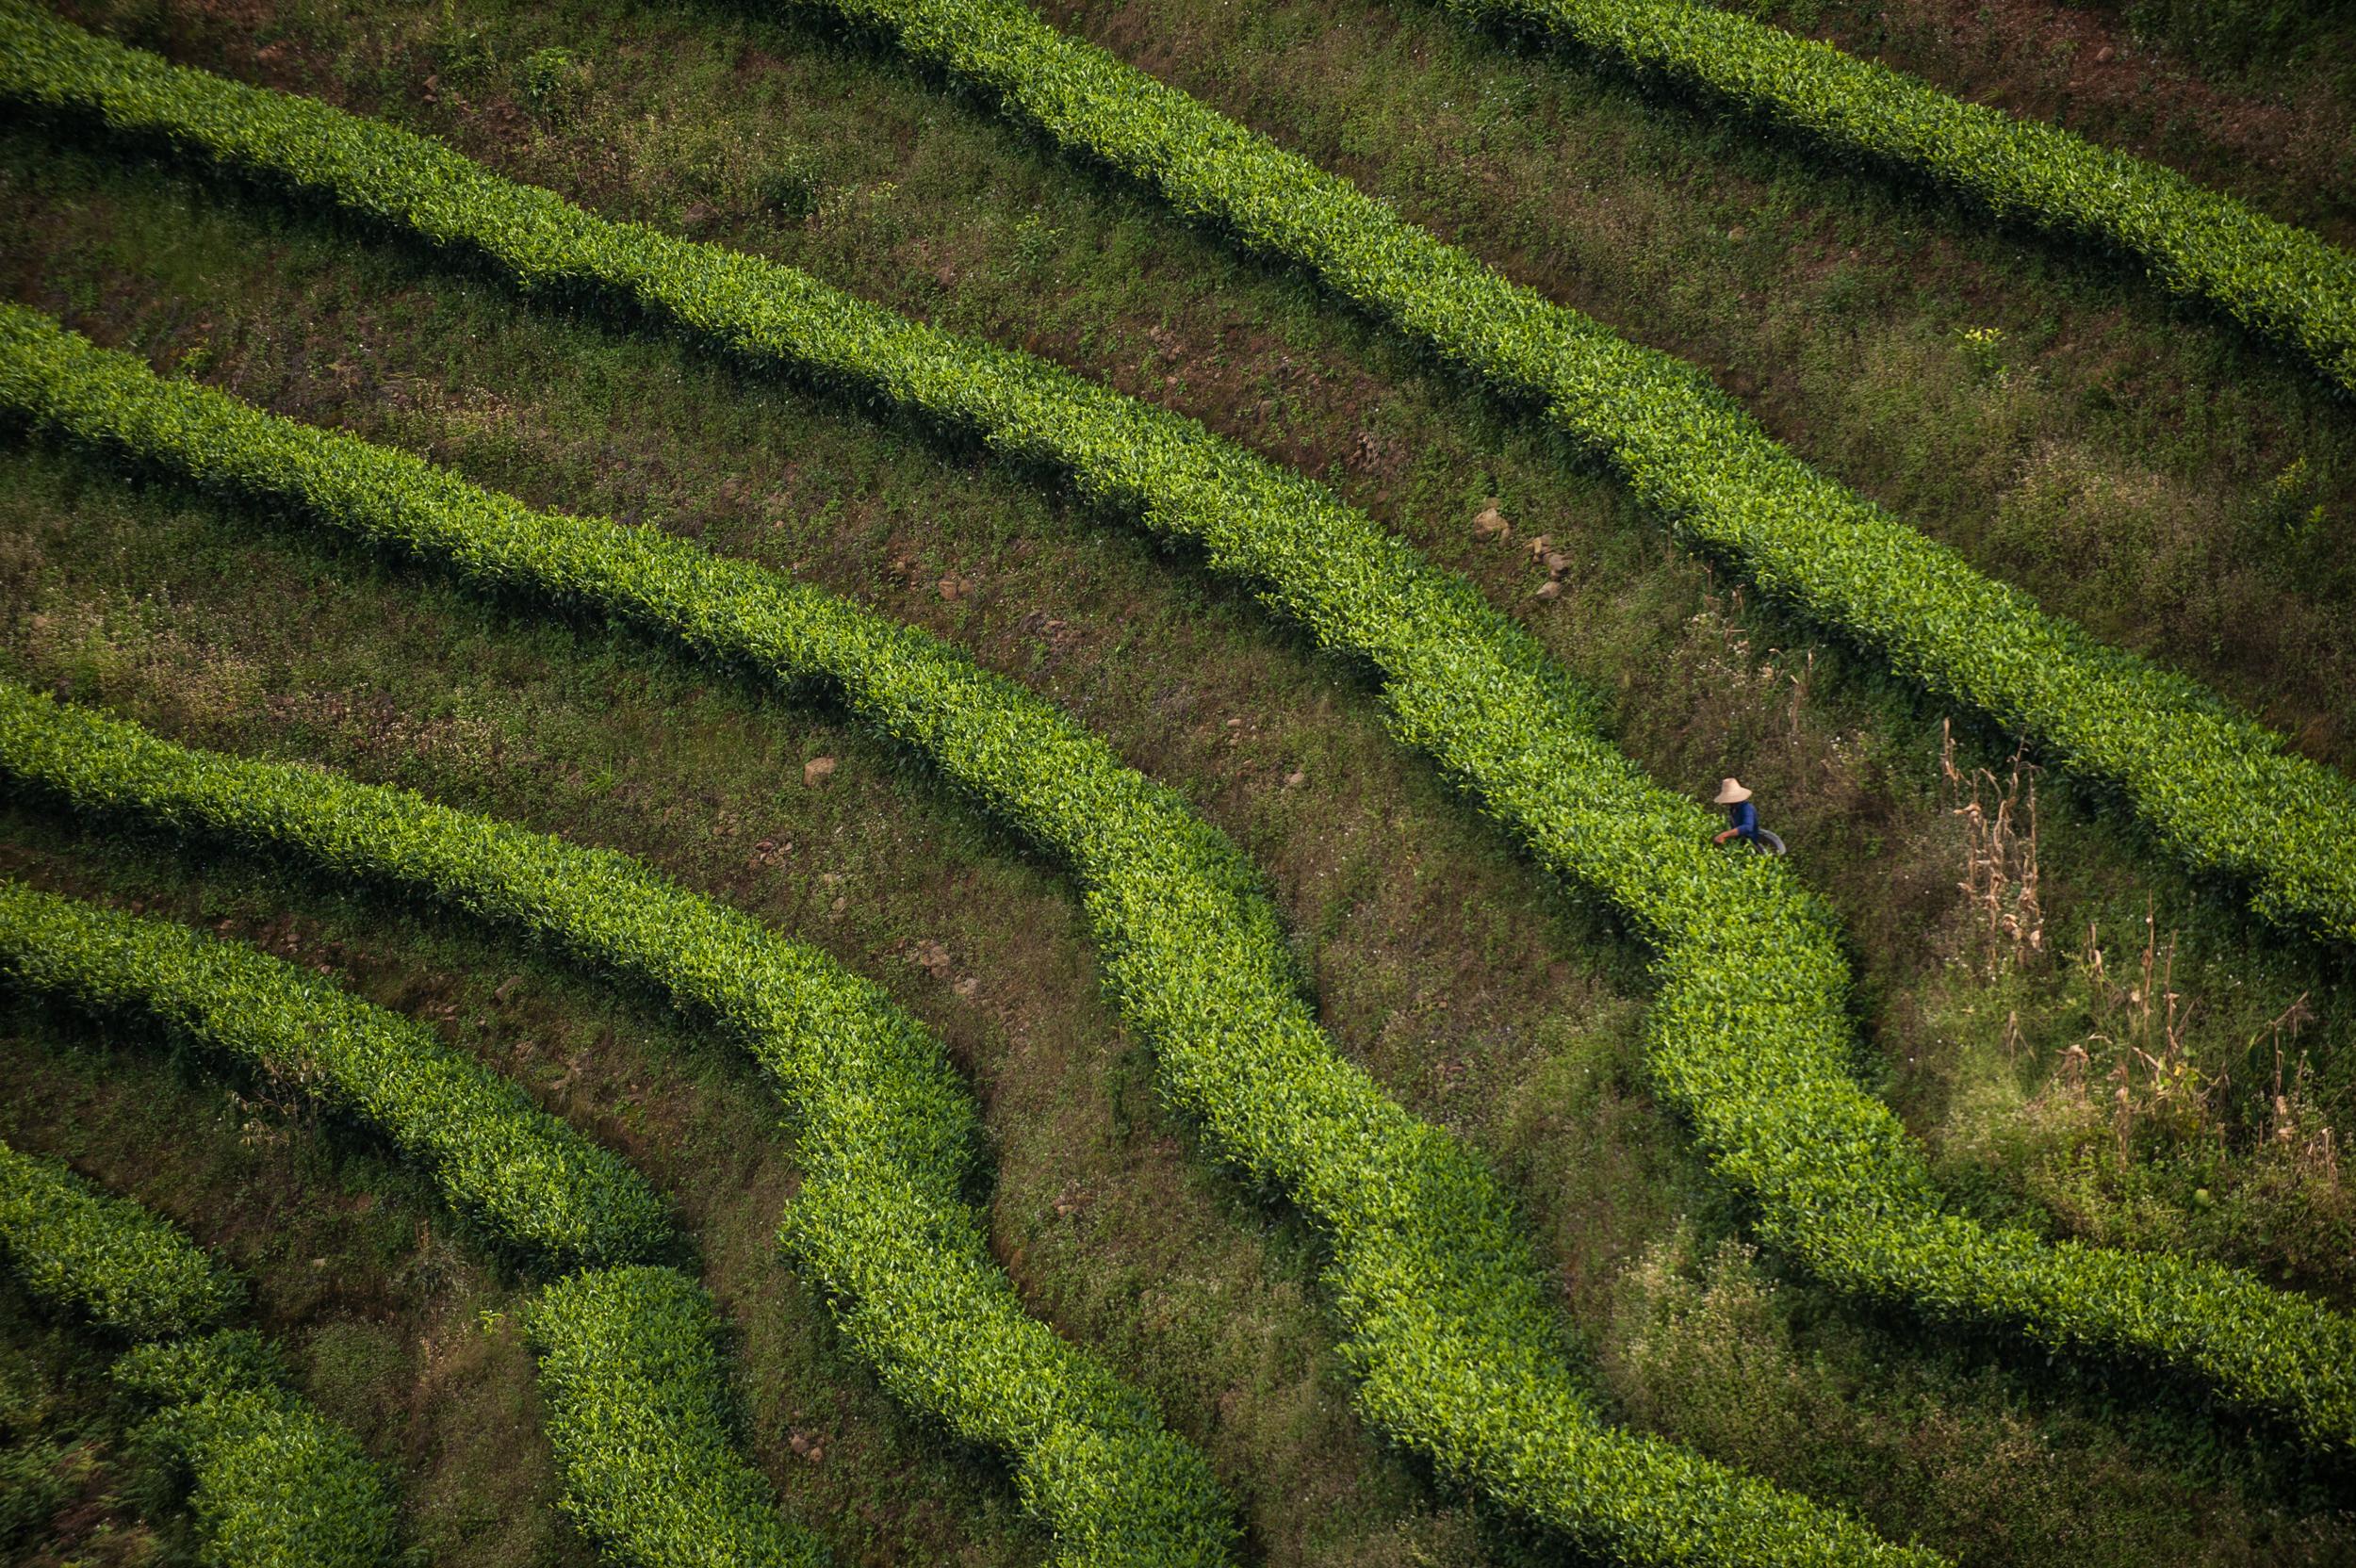 Puer tea bushes _DSC6923.jpg